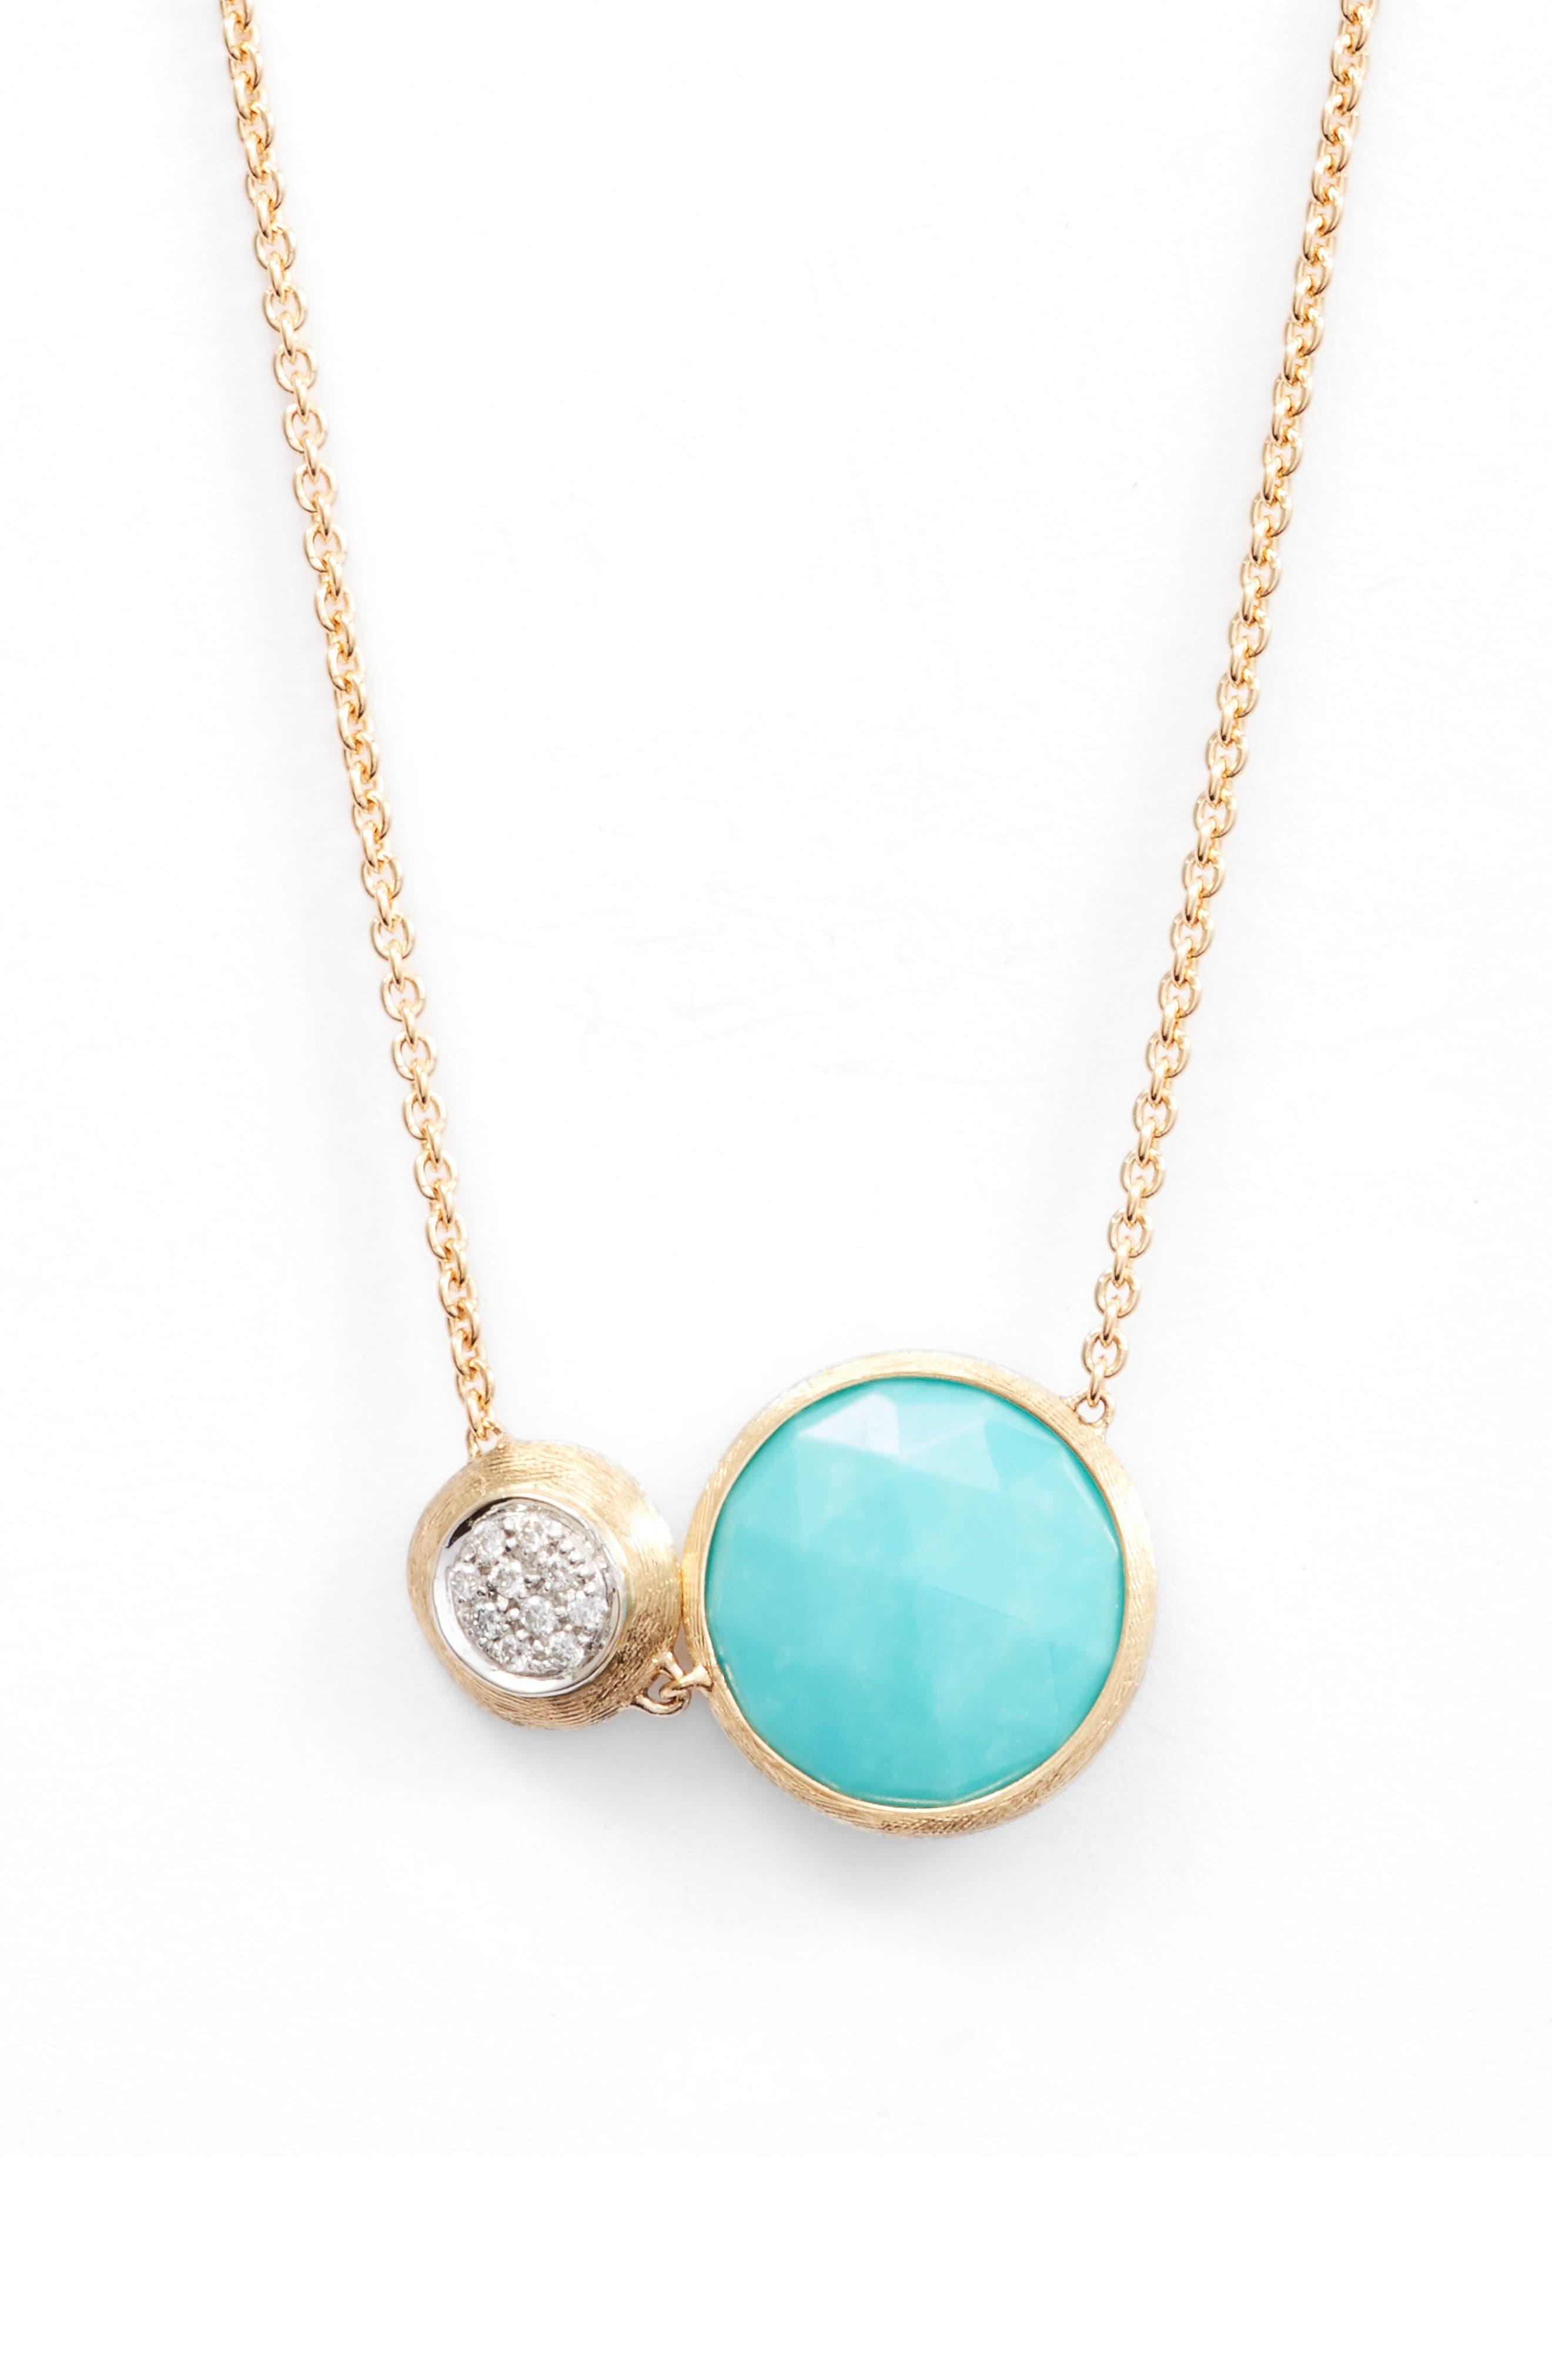 Alternate Image 1 Selected - Marco Bicego Jaipur Turquoise & Diamond Pendant Necklace